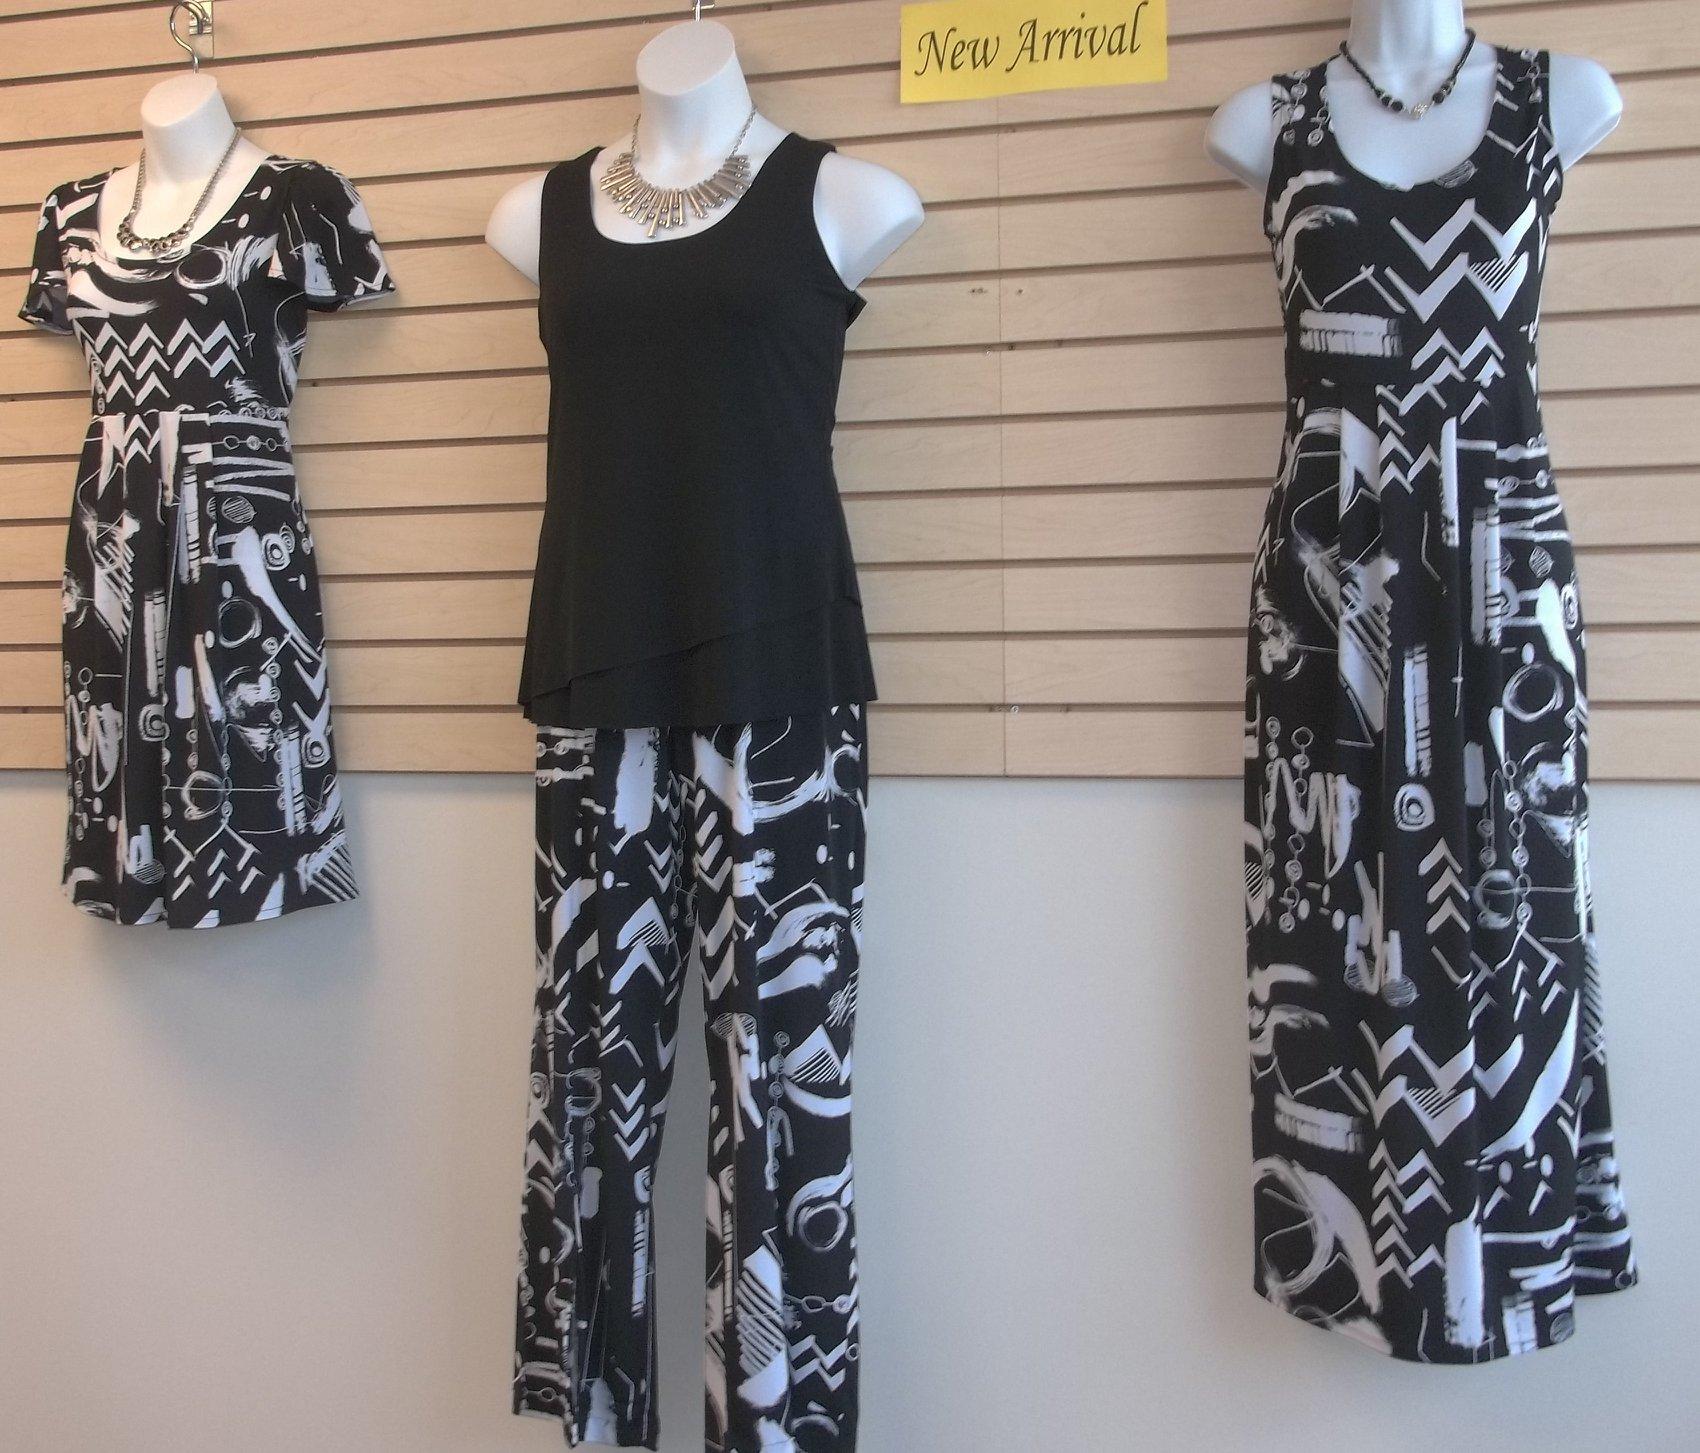 Island Girl Fashions